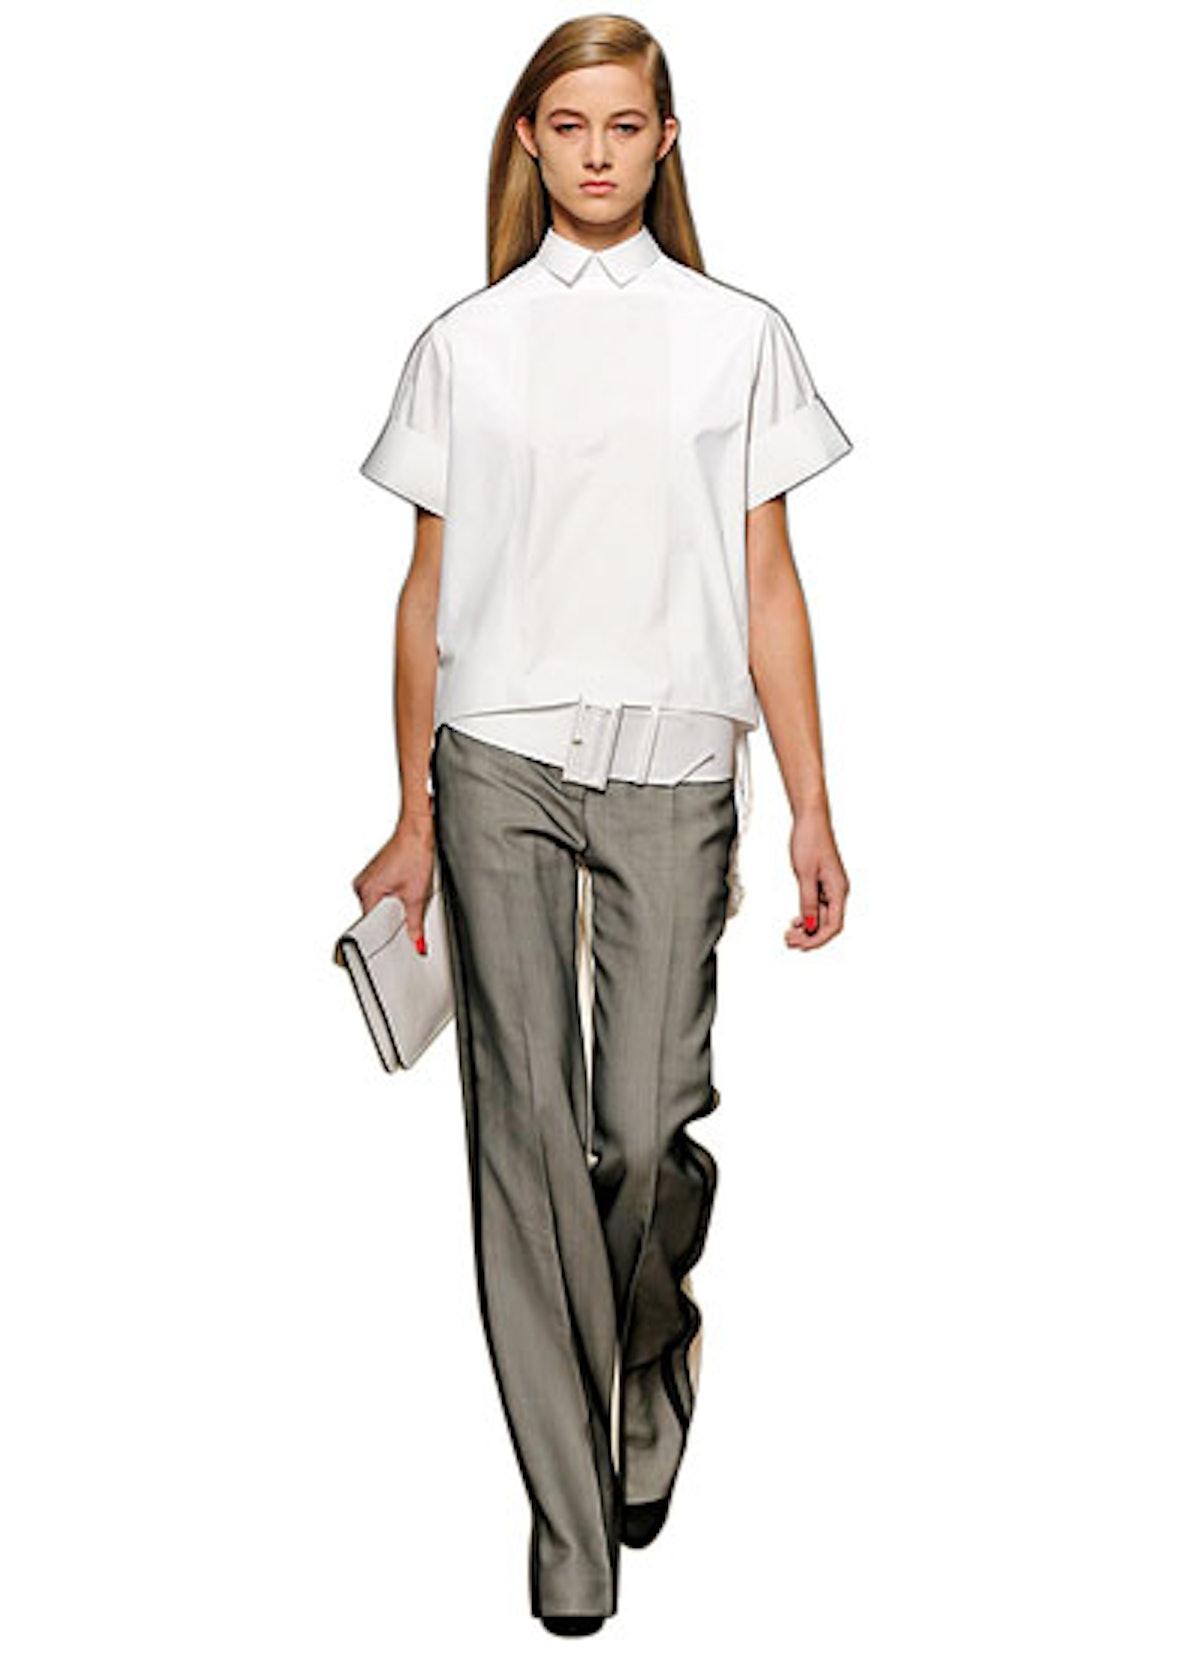 fass-international-style-trends-06-v.jpg